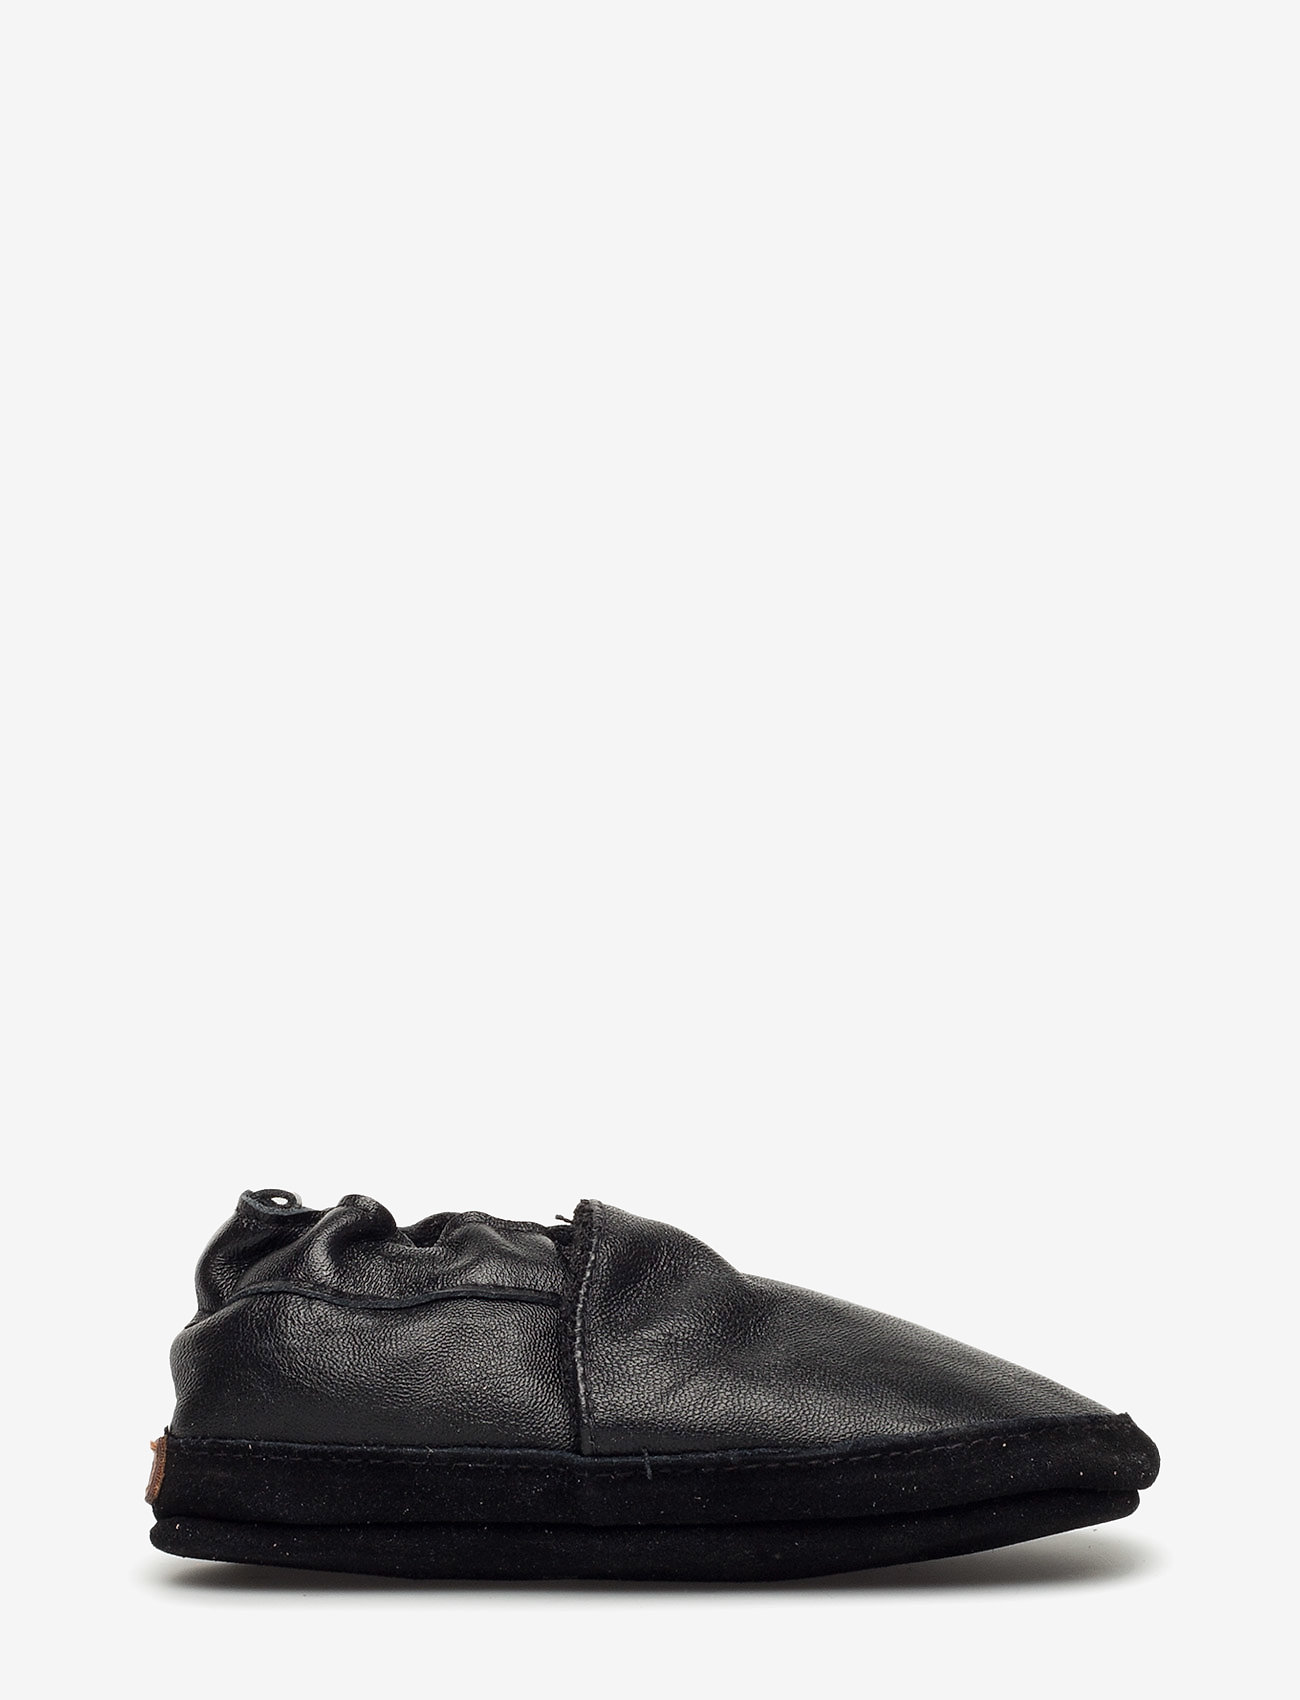 Melton - Leather shoe - Loafer - buty - 190/black - 1